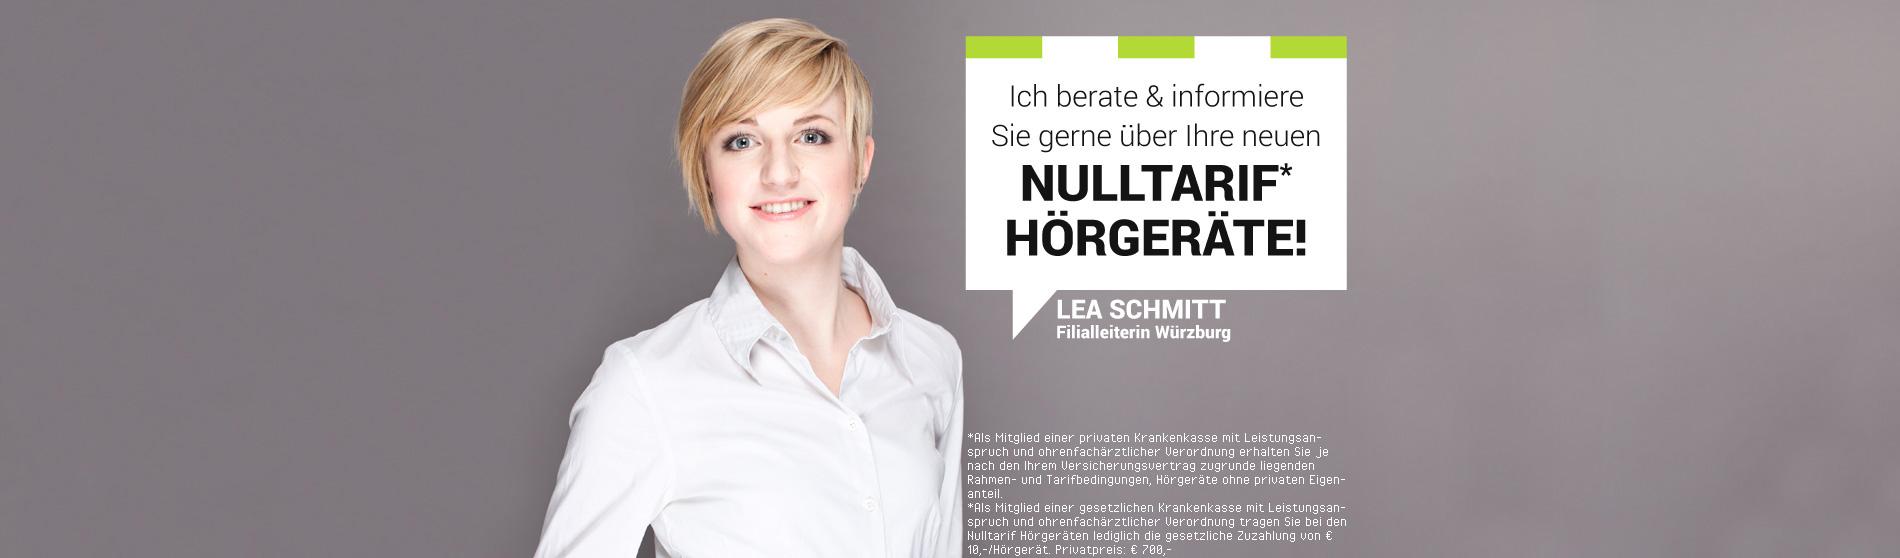 Nulltarif* Hörgeräte Lea Schmitt Sliderbild